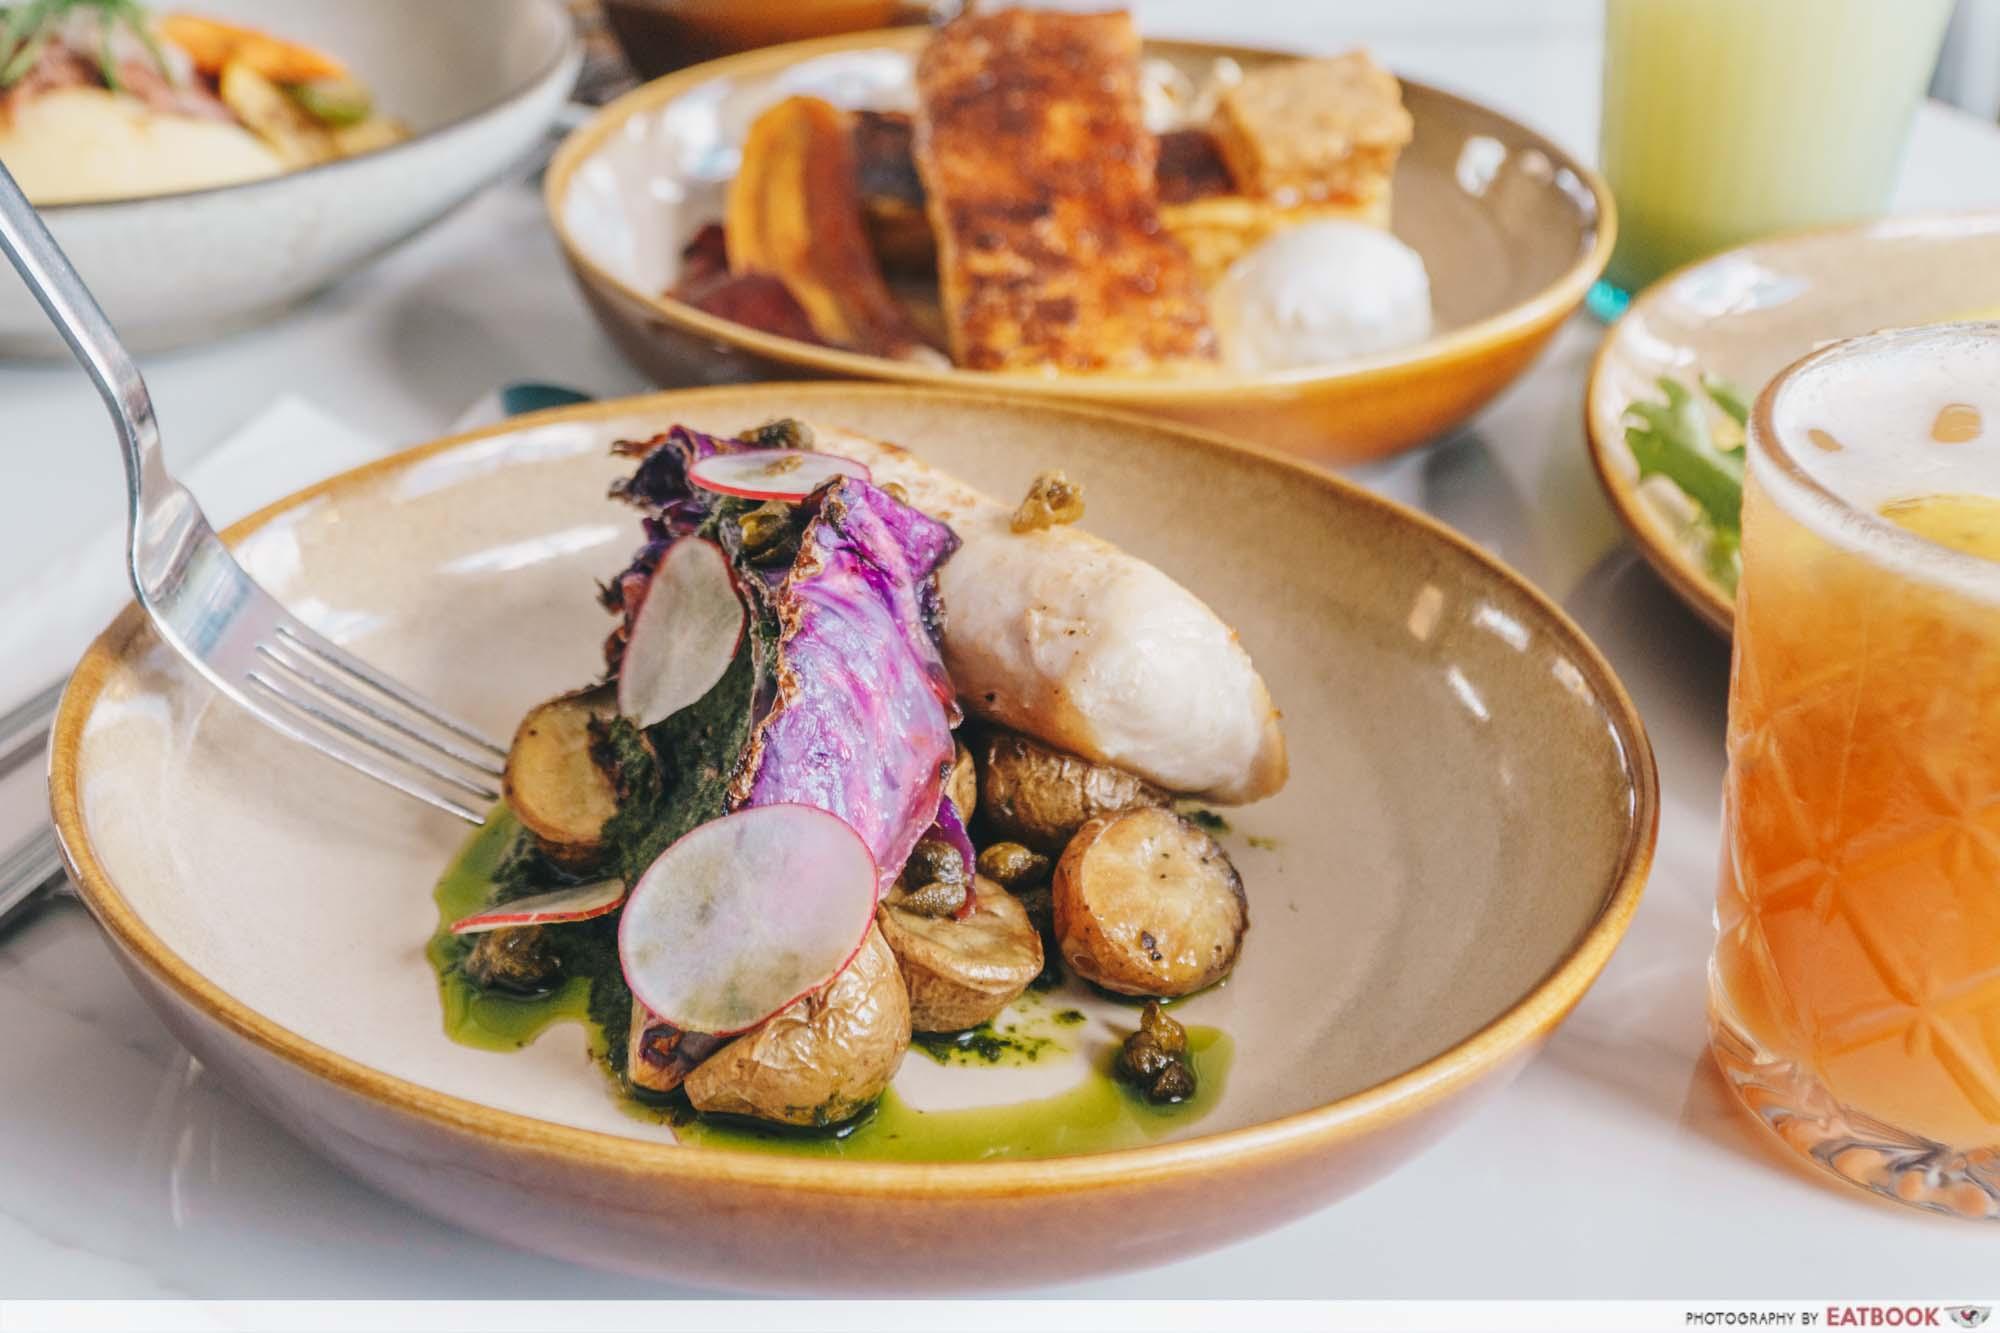 Tropique Cafe & Restaurant - Butter Fish